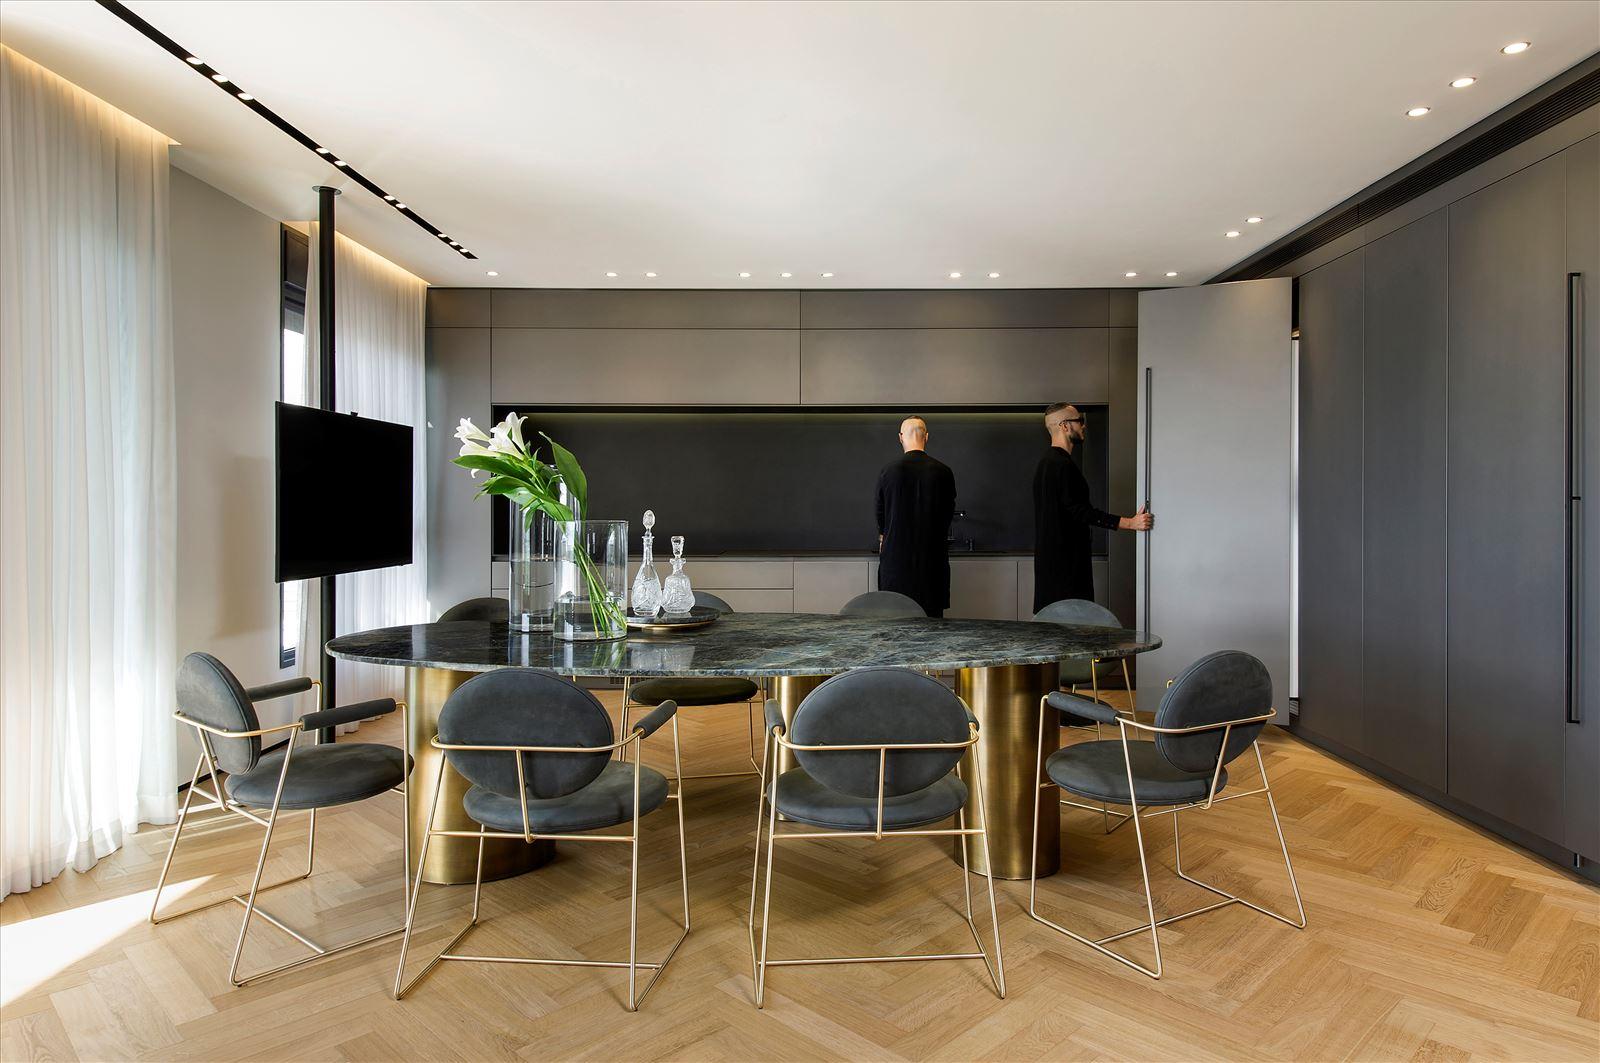 Penthouse - Petah Tikva גופי תאורה מעוצבים בתקרת המטבח בעיצובו של קמחי דורי